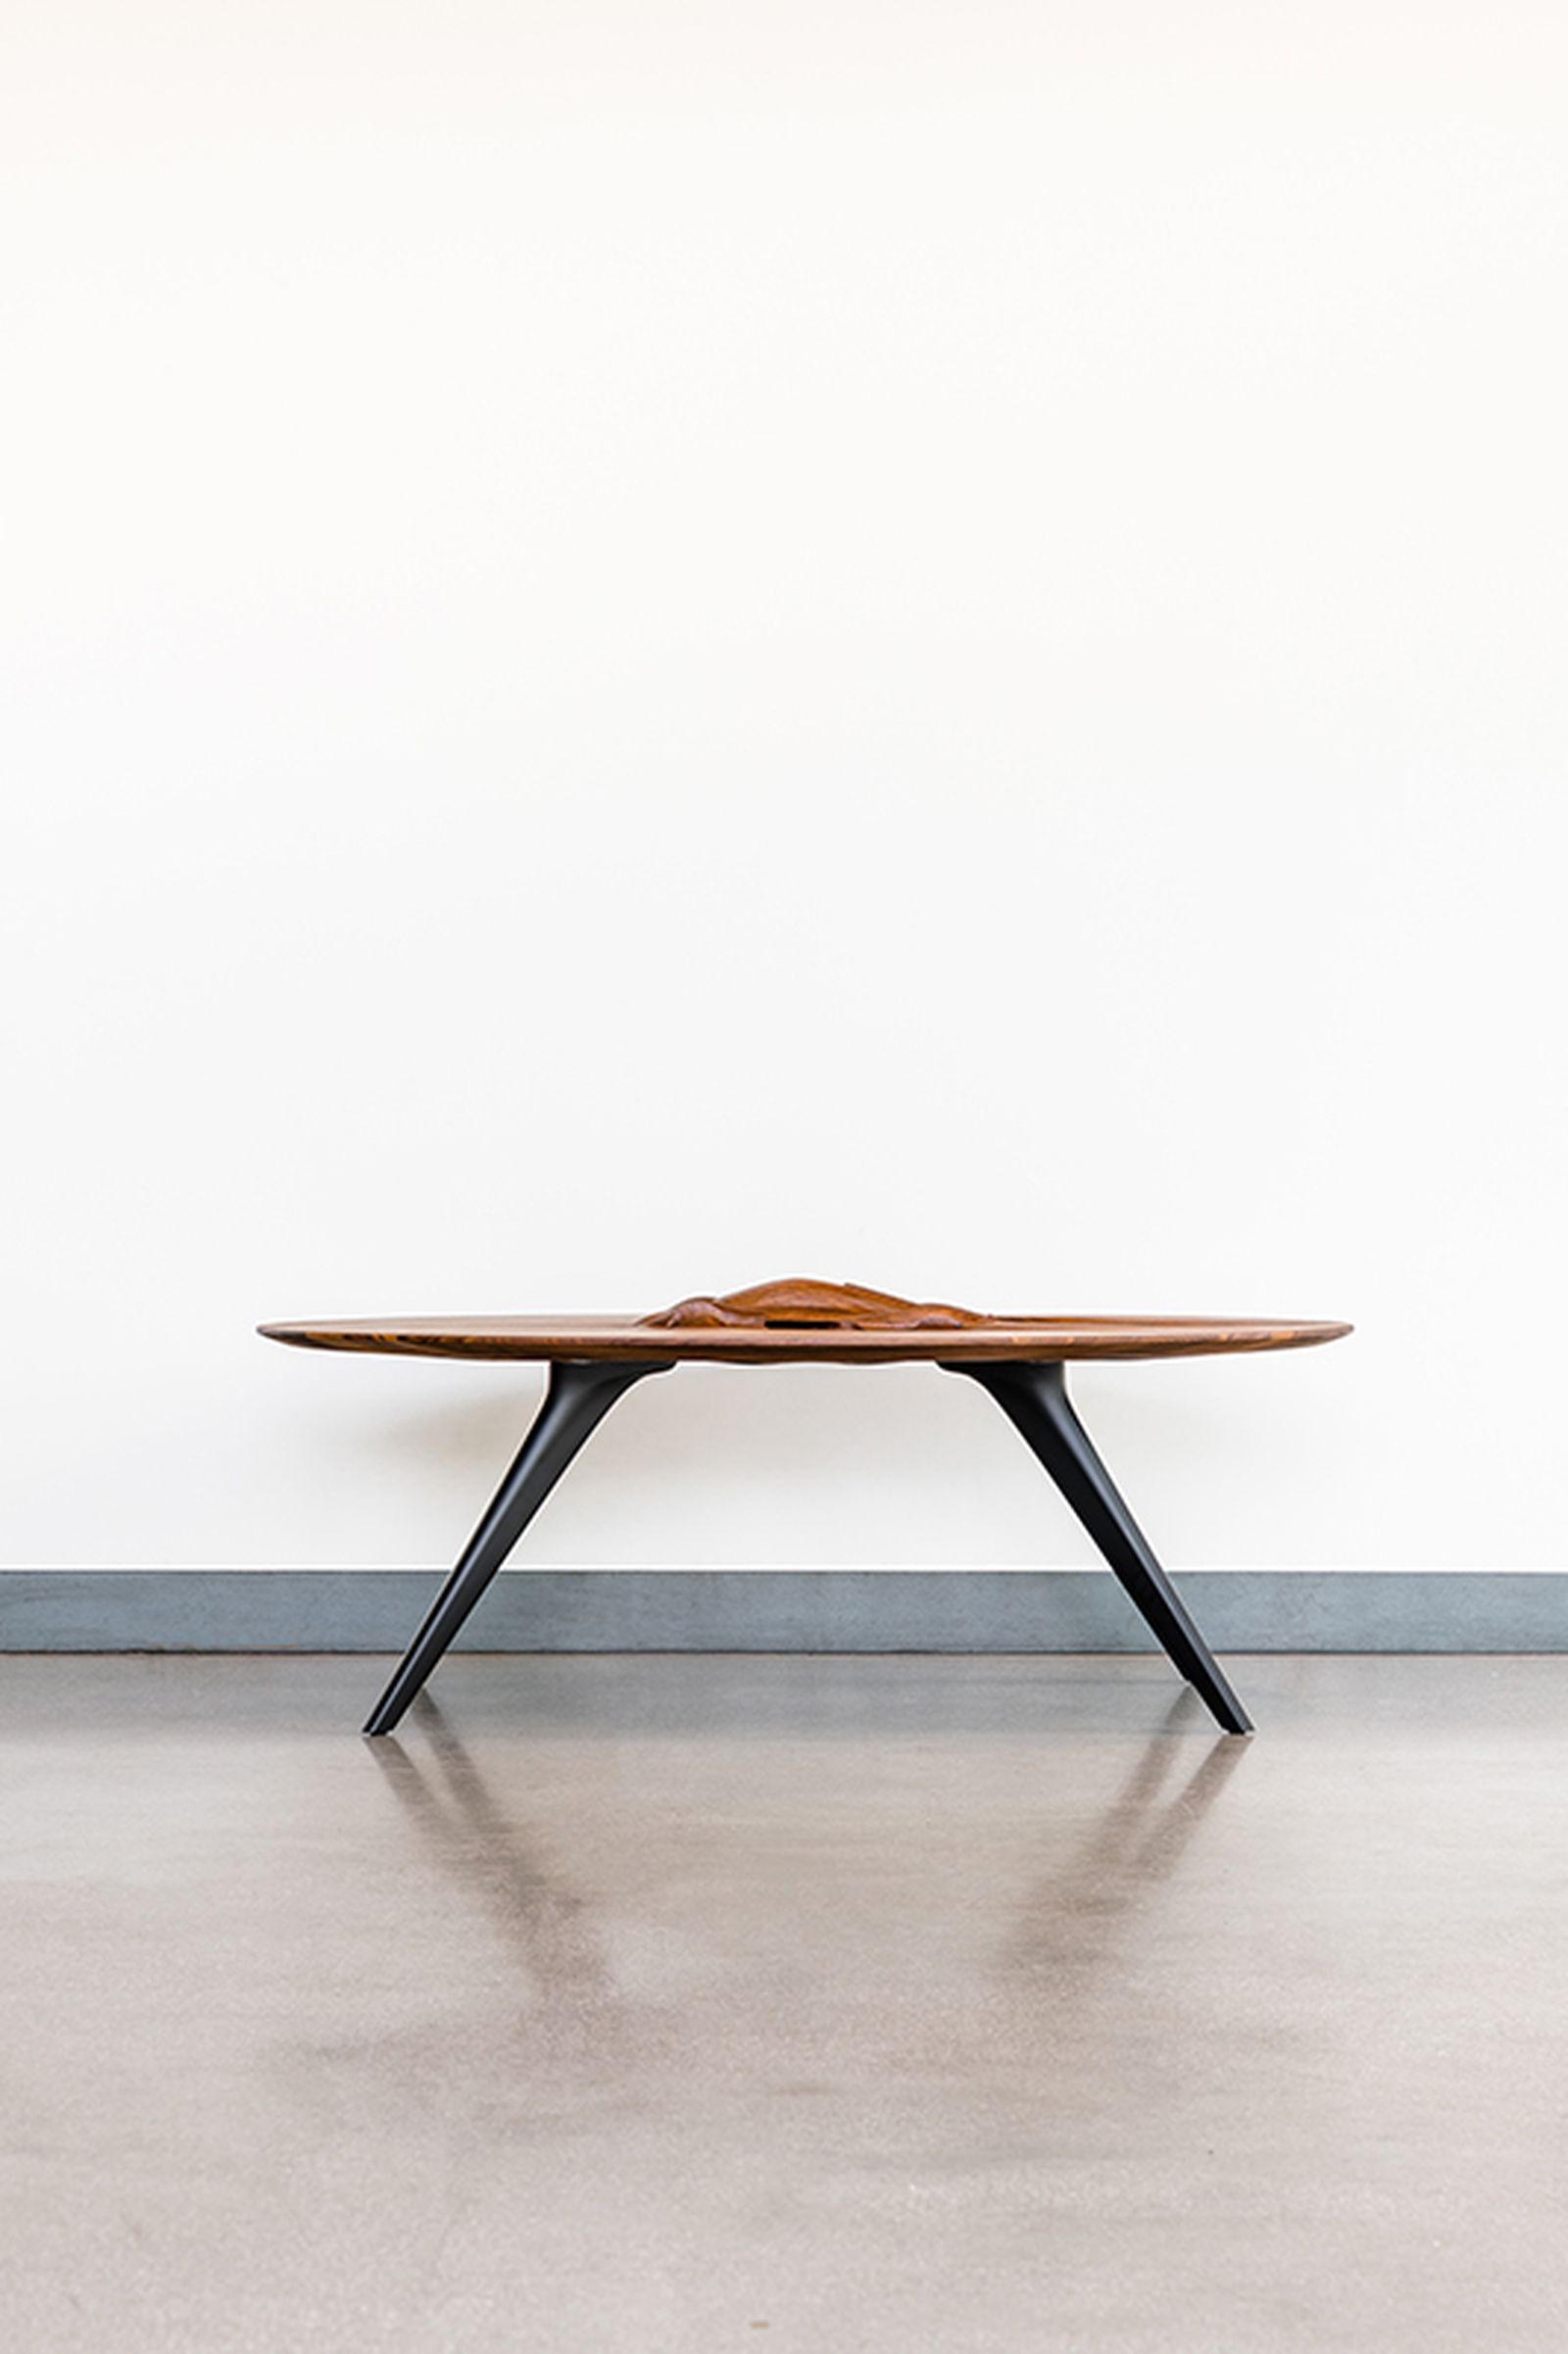 aston martin valkyrie wake coffee table discommon